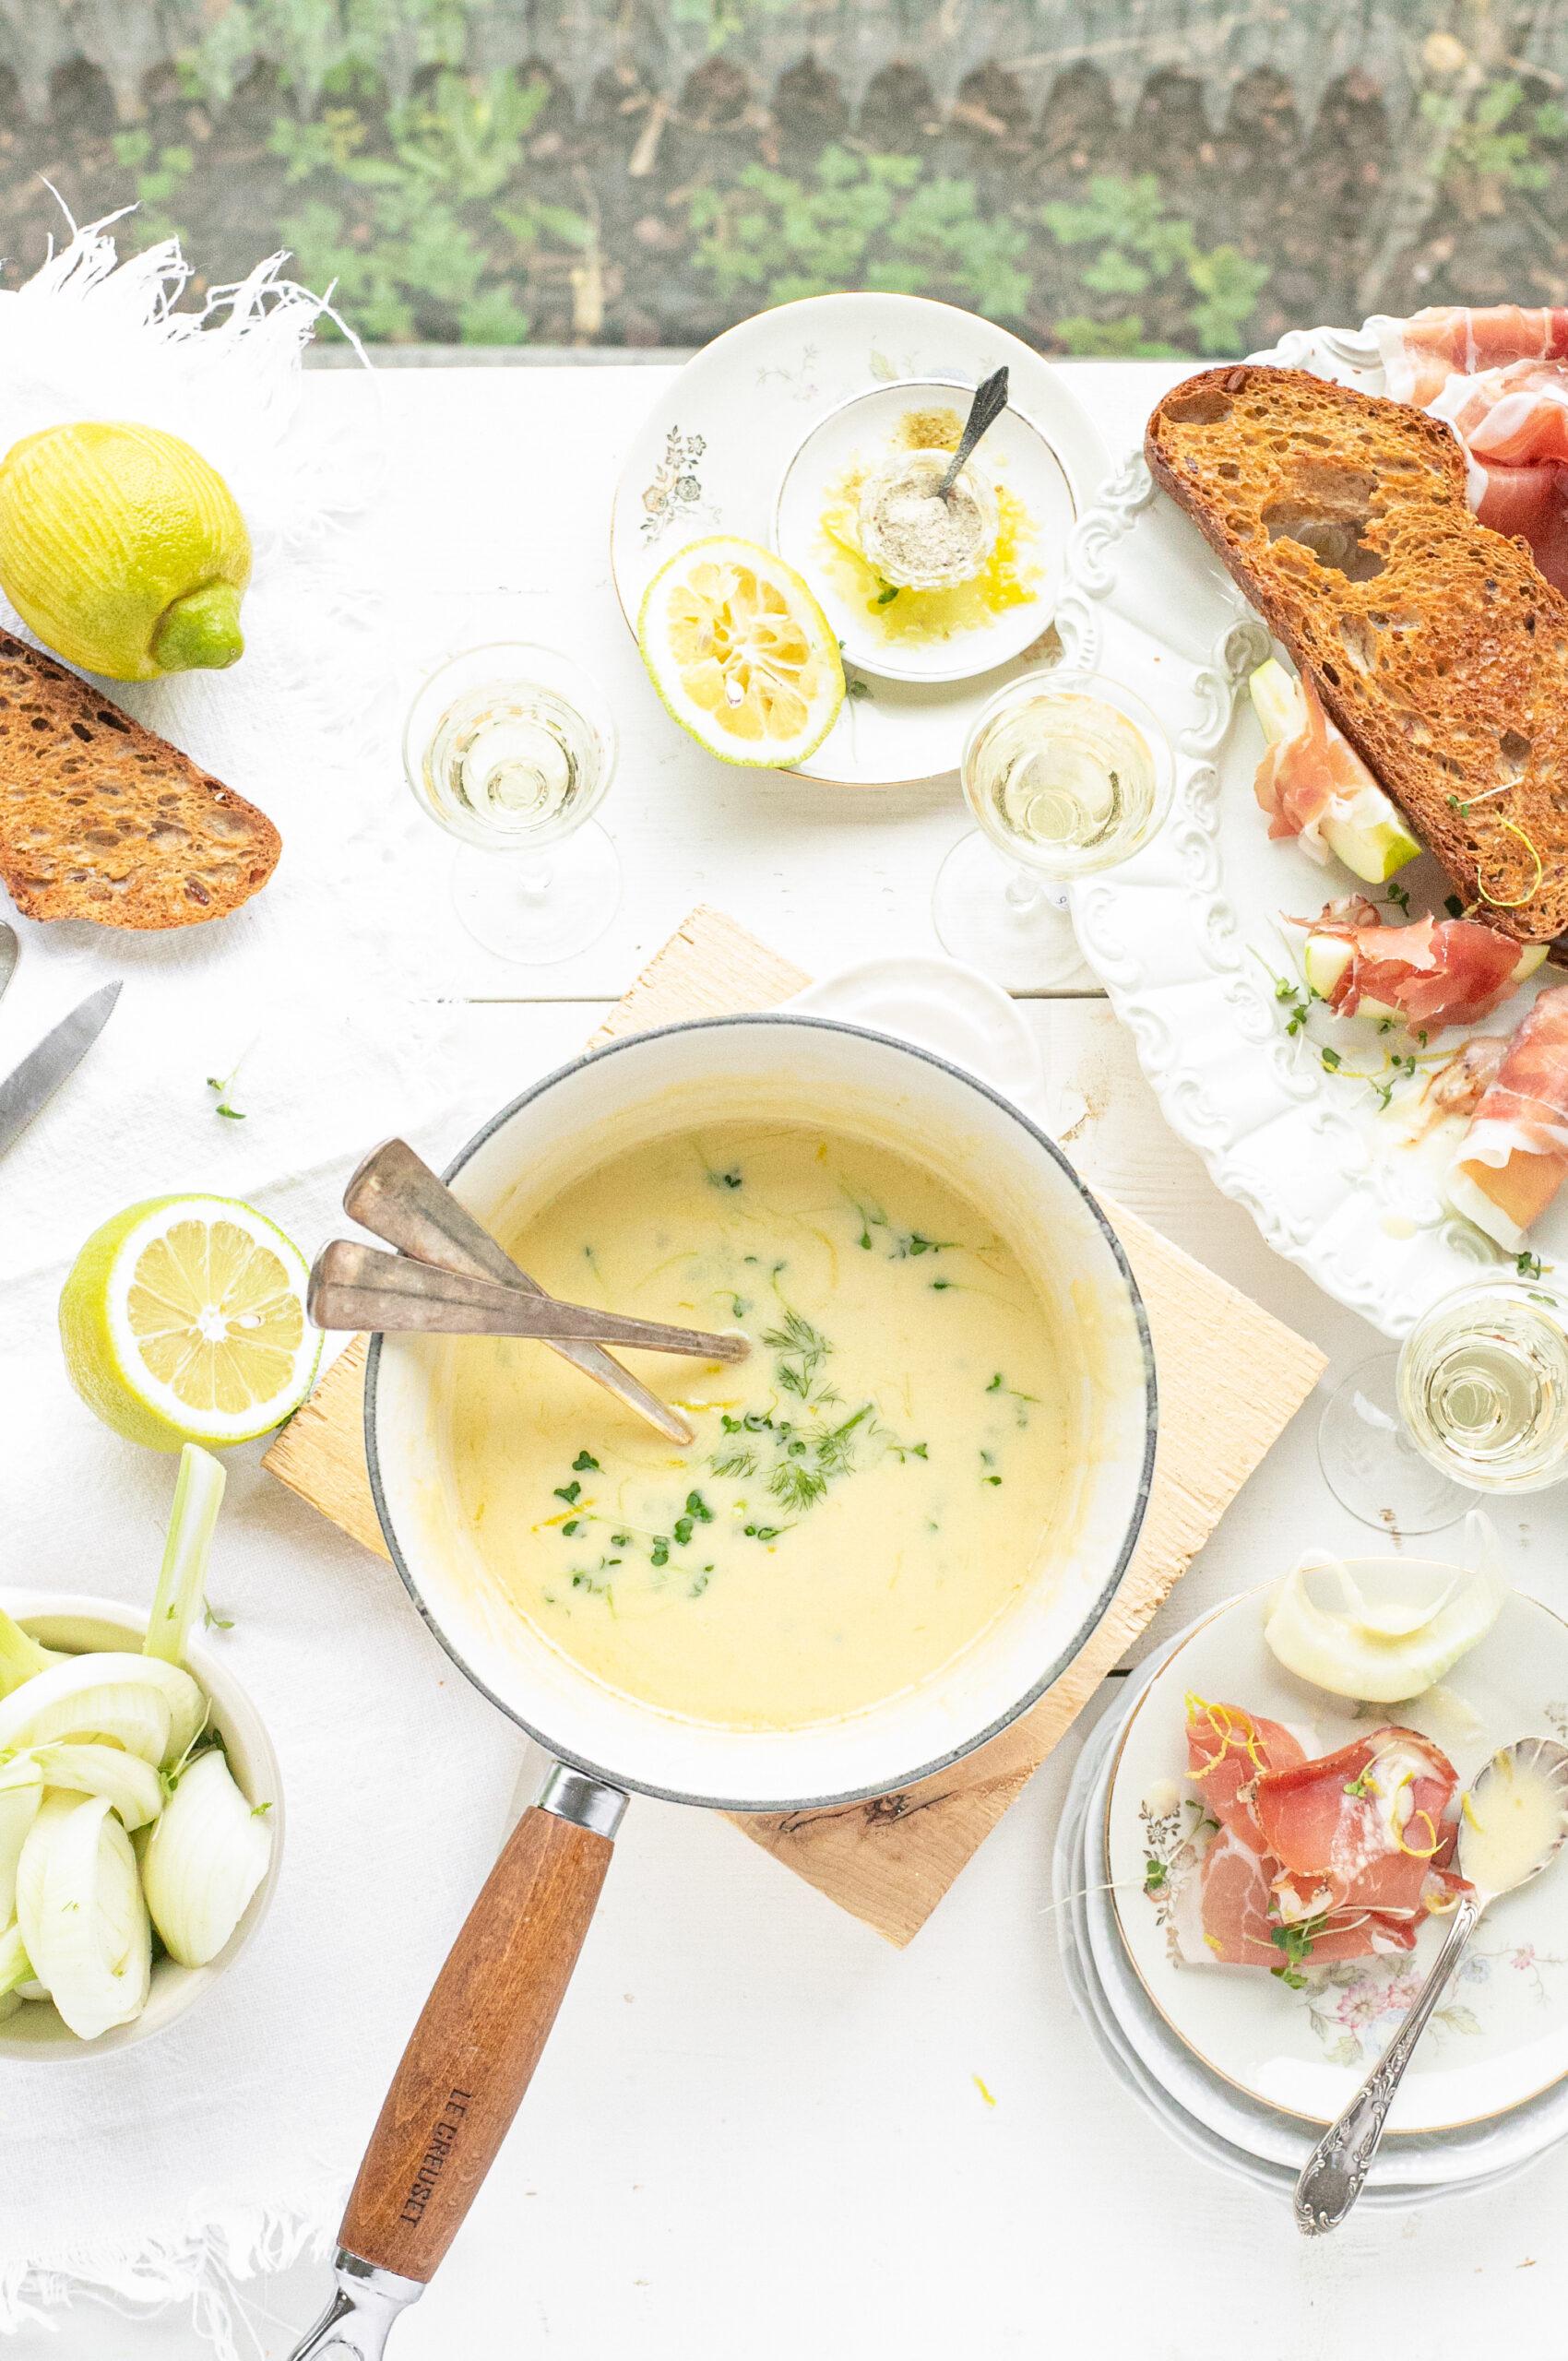 kaas fondue met appel en speck staand